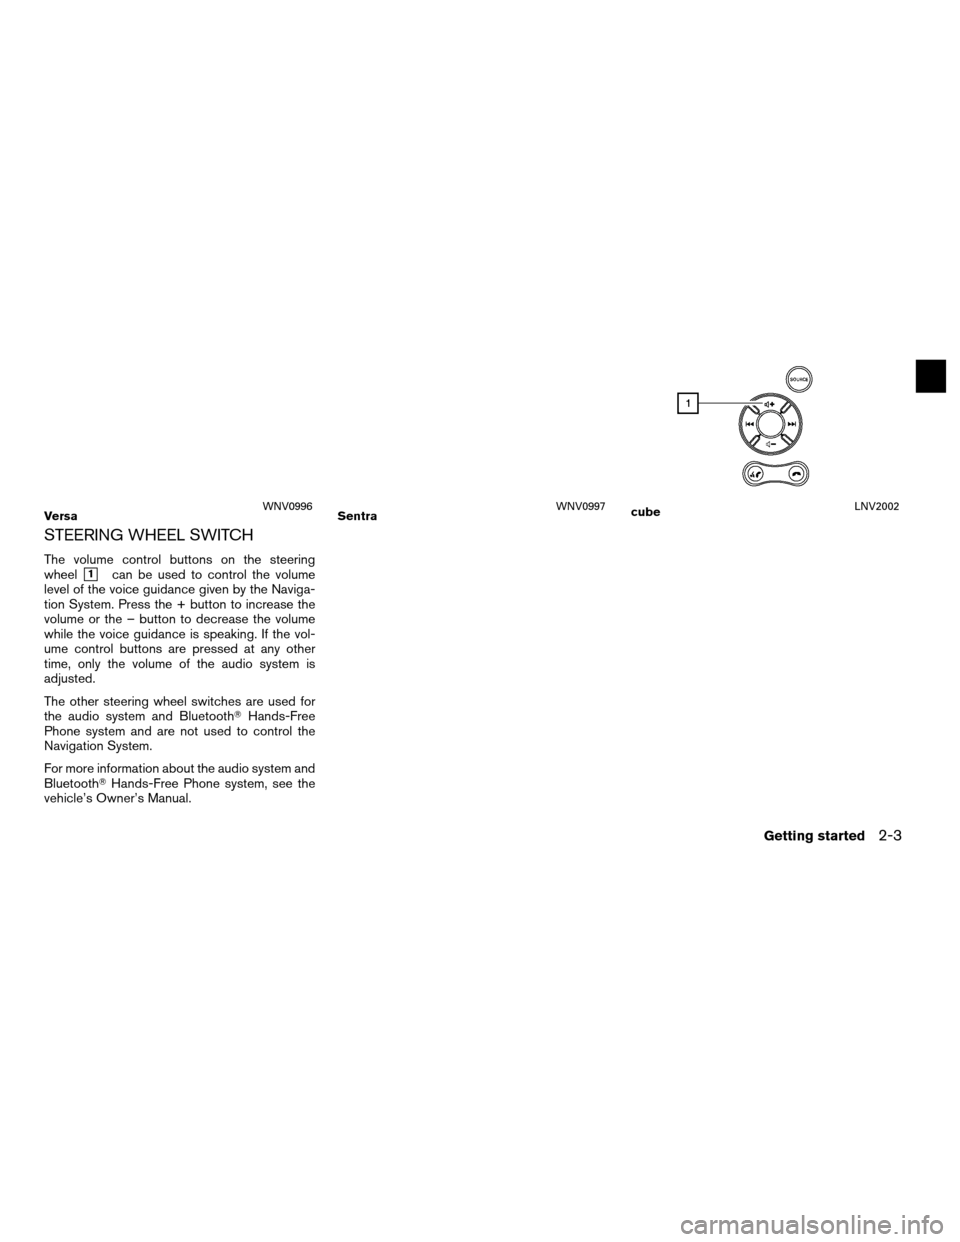 NISSAN JUKE 2012 F15 / 1.G LC Navigation Manual